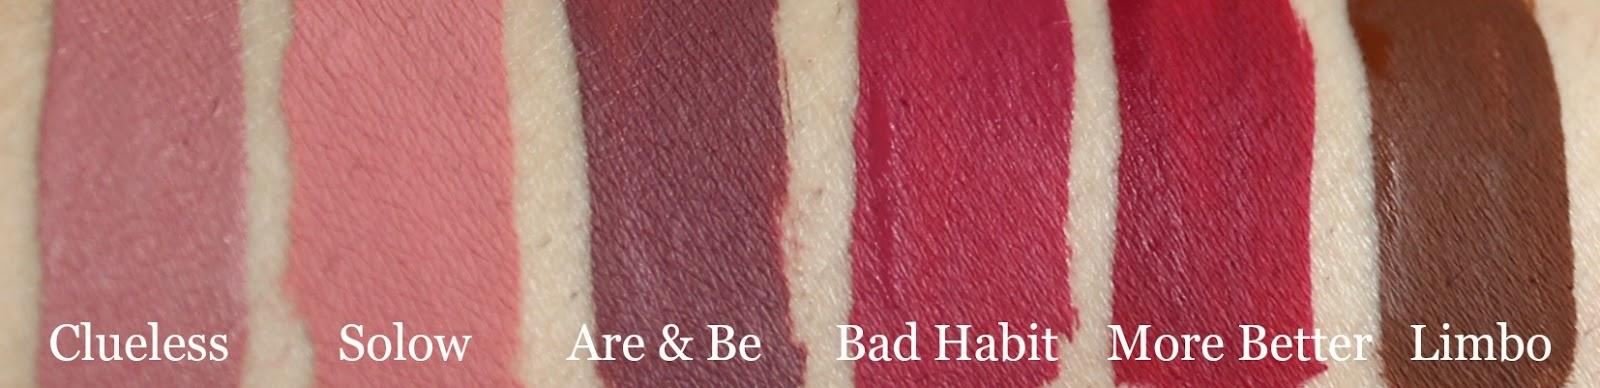 colourpop liquid lipstick clueless, solow, are n b, bad habit, more better, limbo swatch